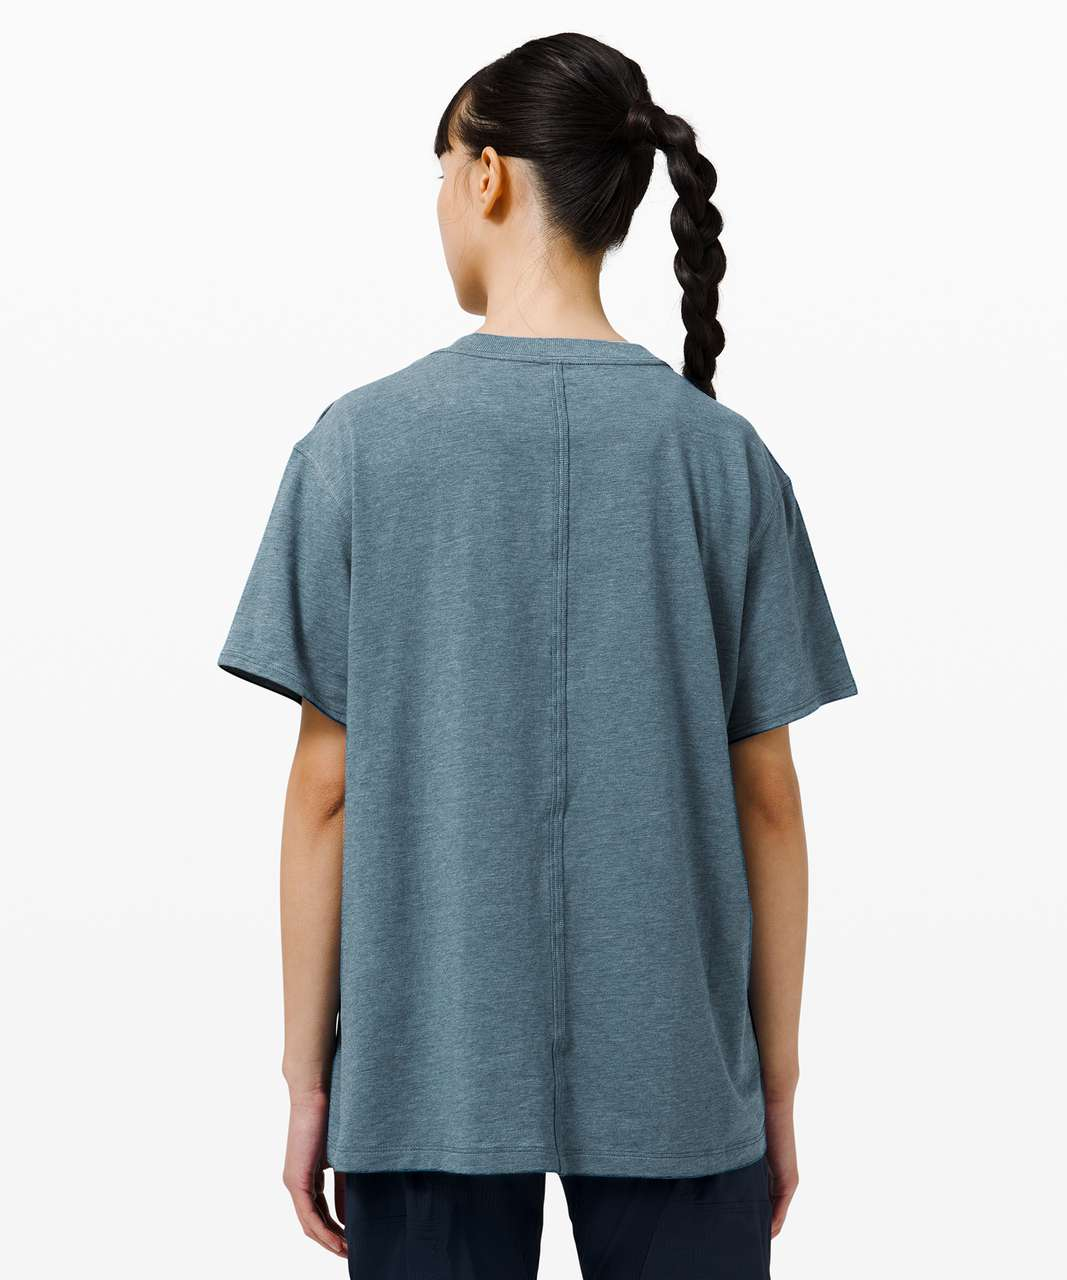 Lululemon All Yours Tee - Heathered Blue Borealis